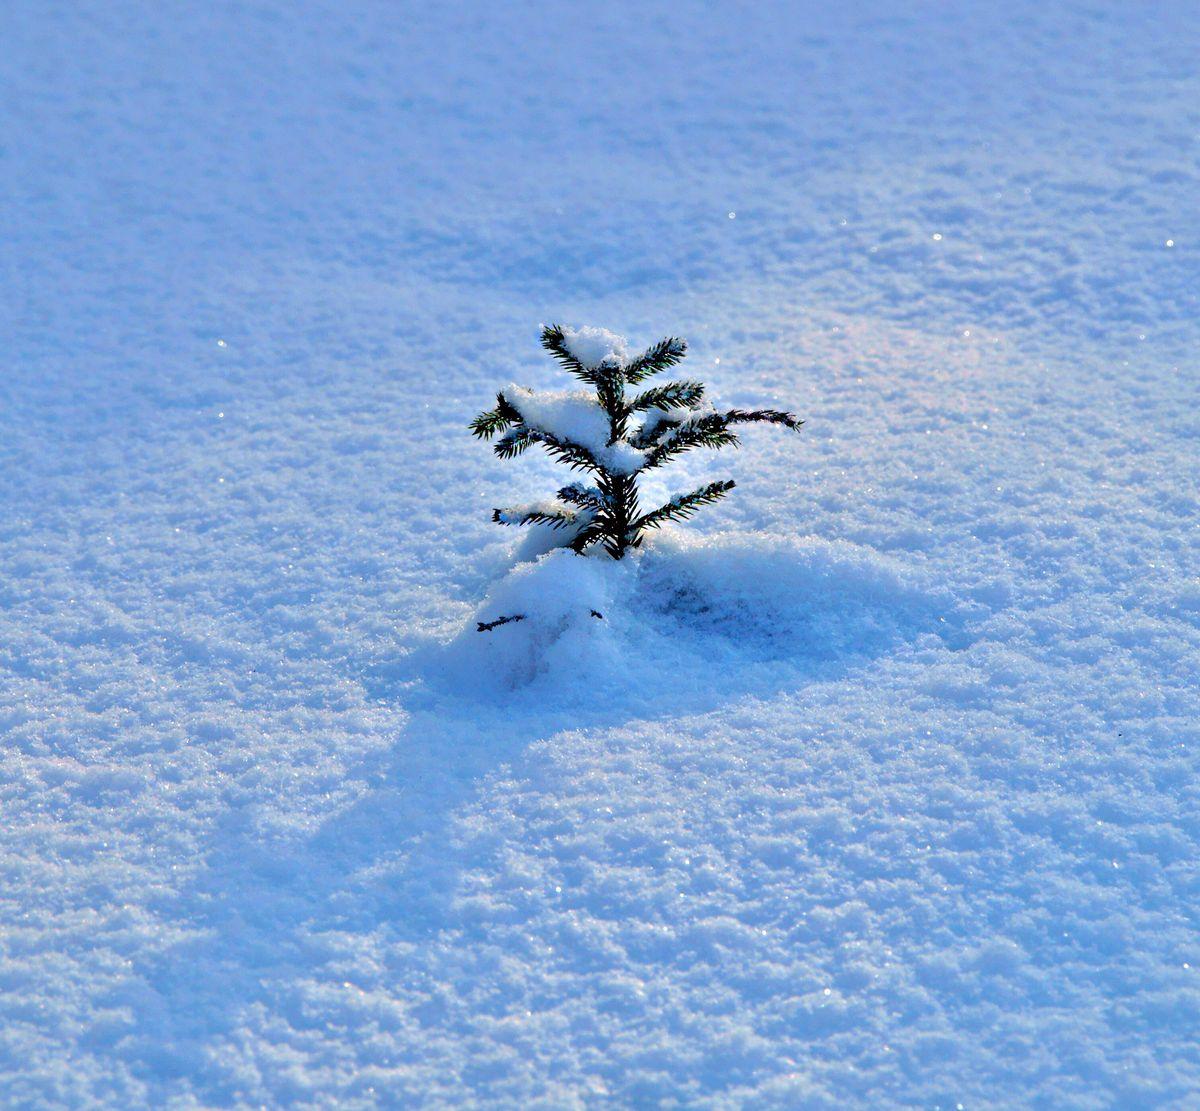 """Мороз снежком укутывал..."""